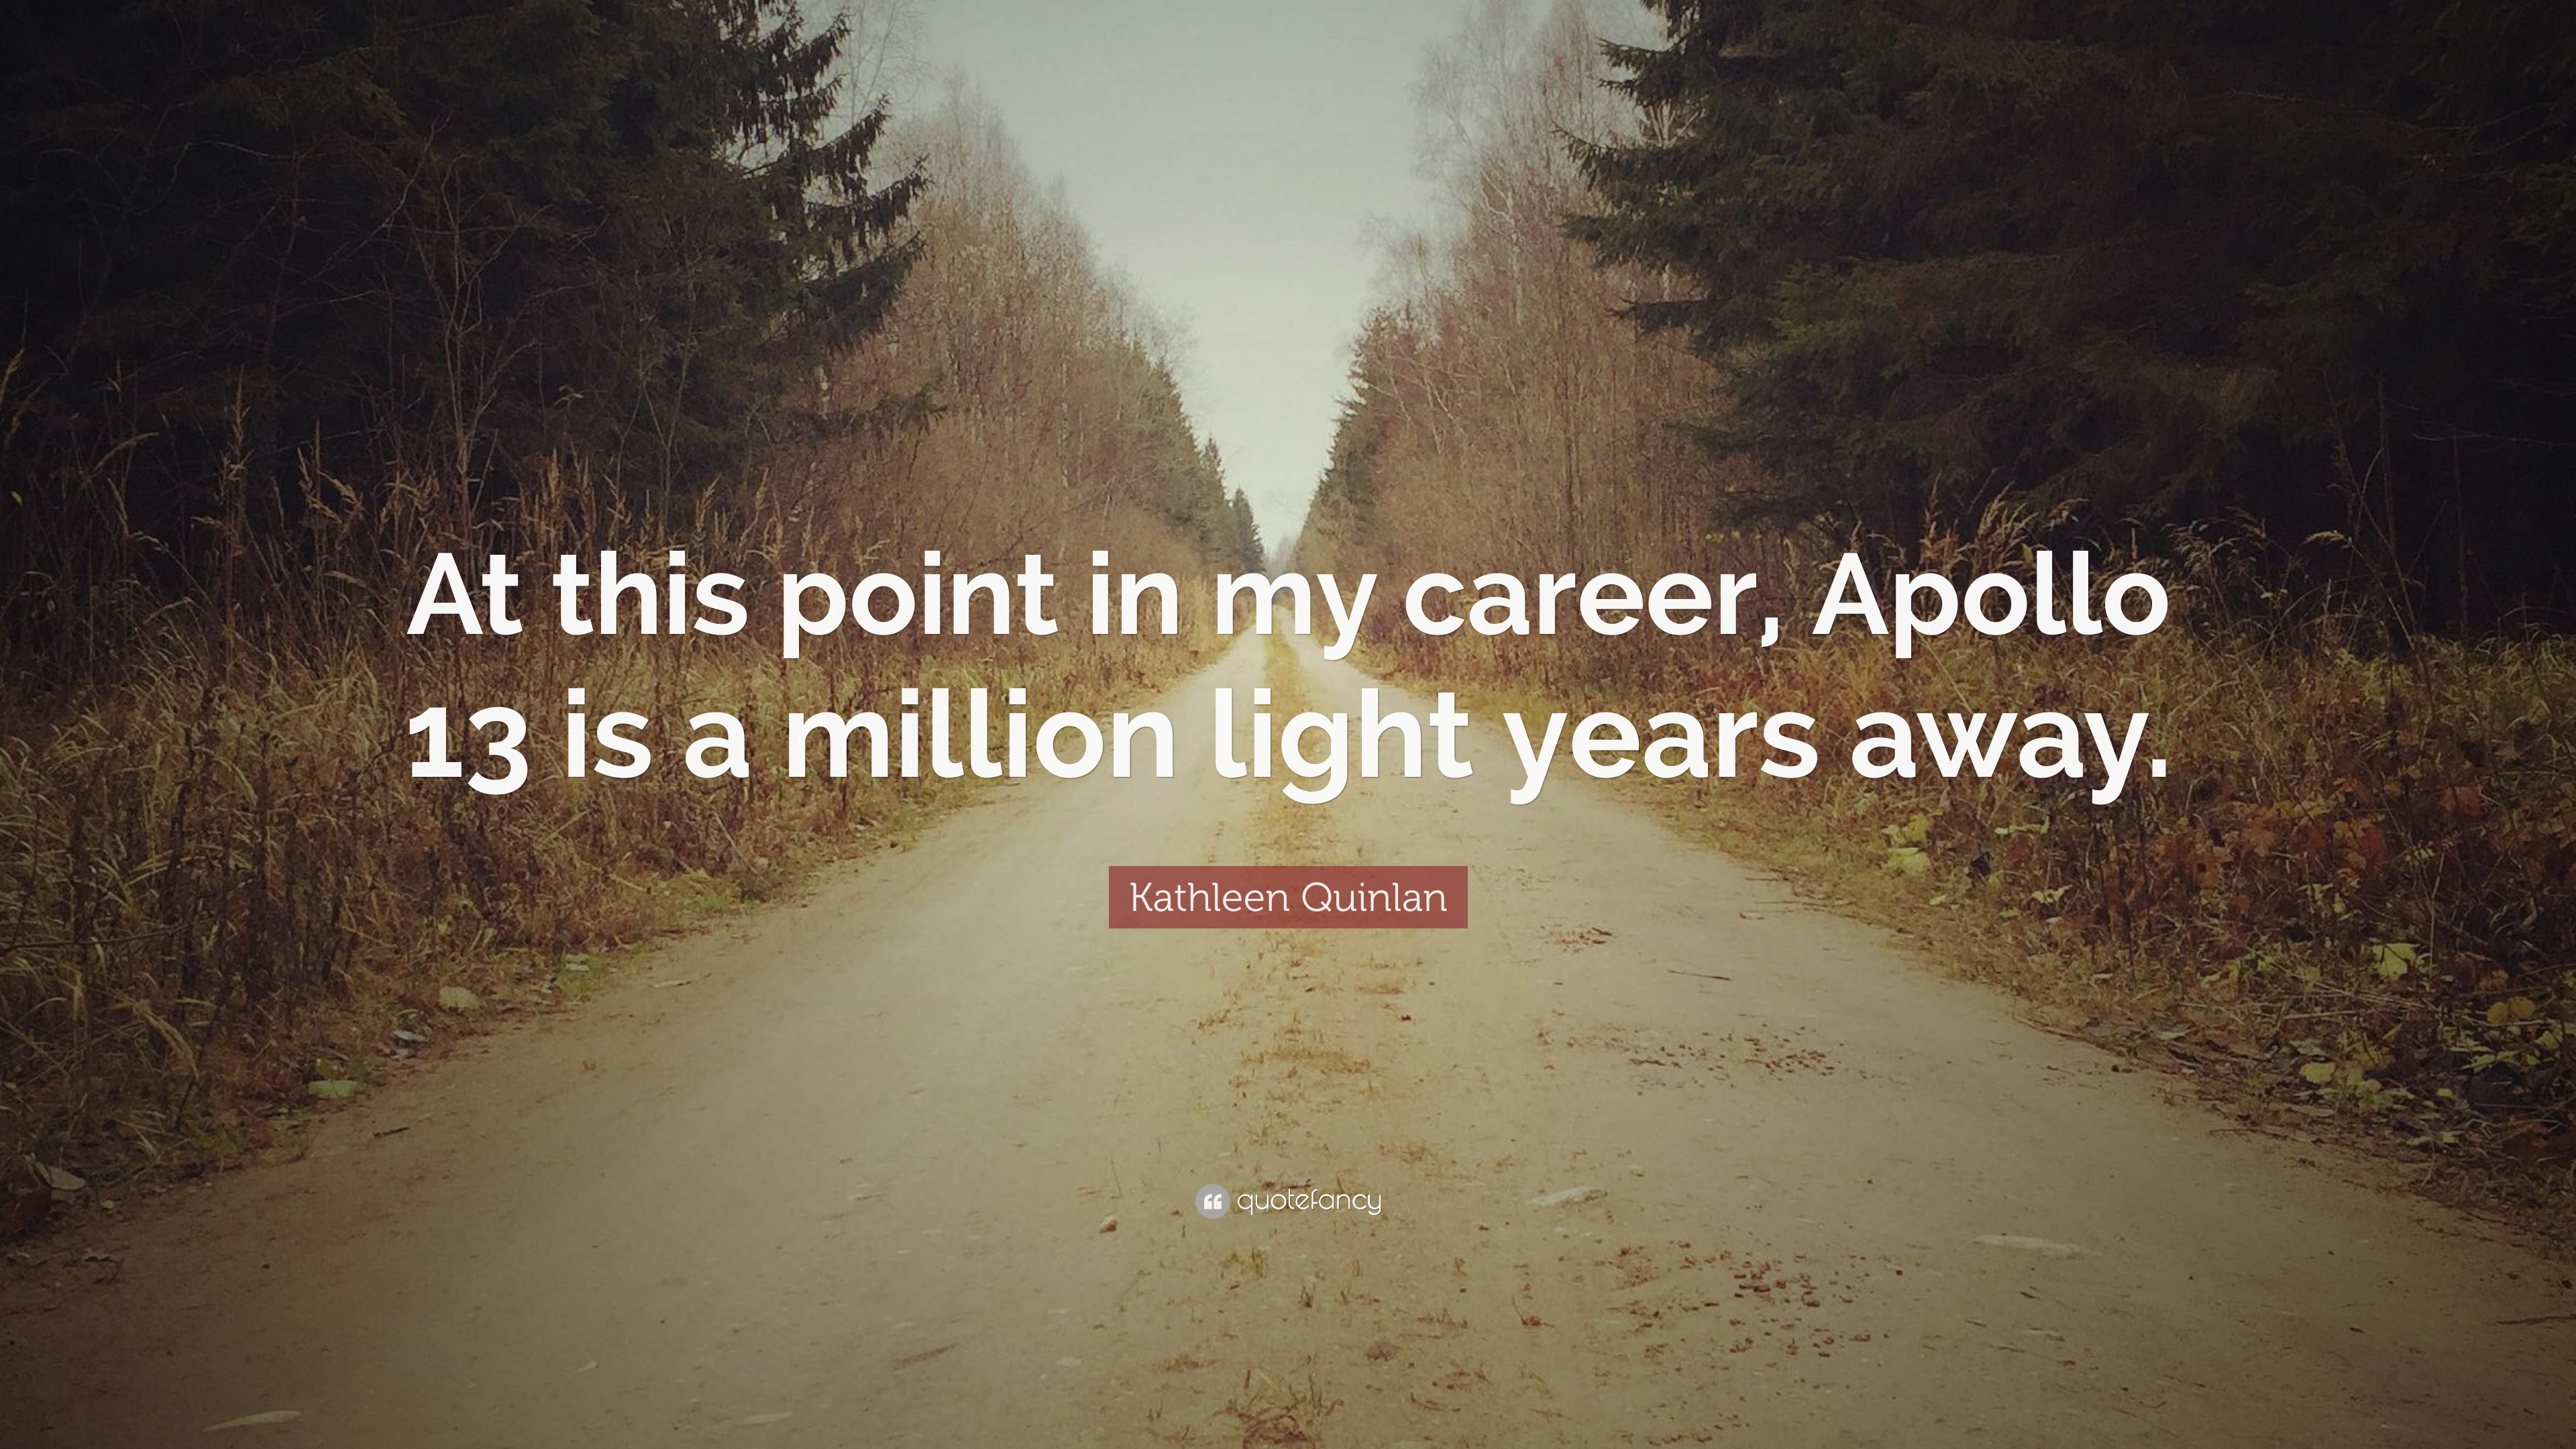 Apollo 13 Quotes Beautiful kathleen quinlan quotes (14 wallpapers) - quotefancy